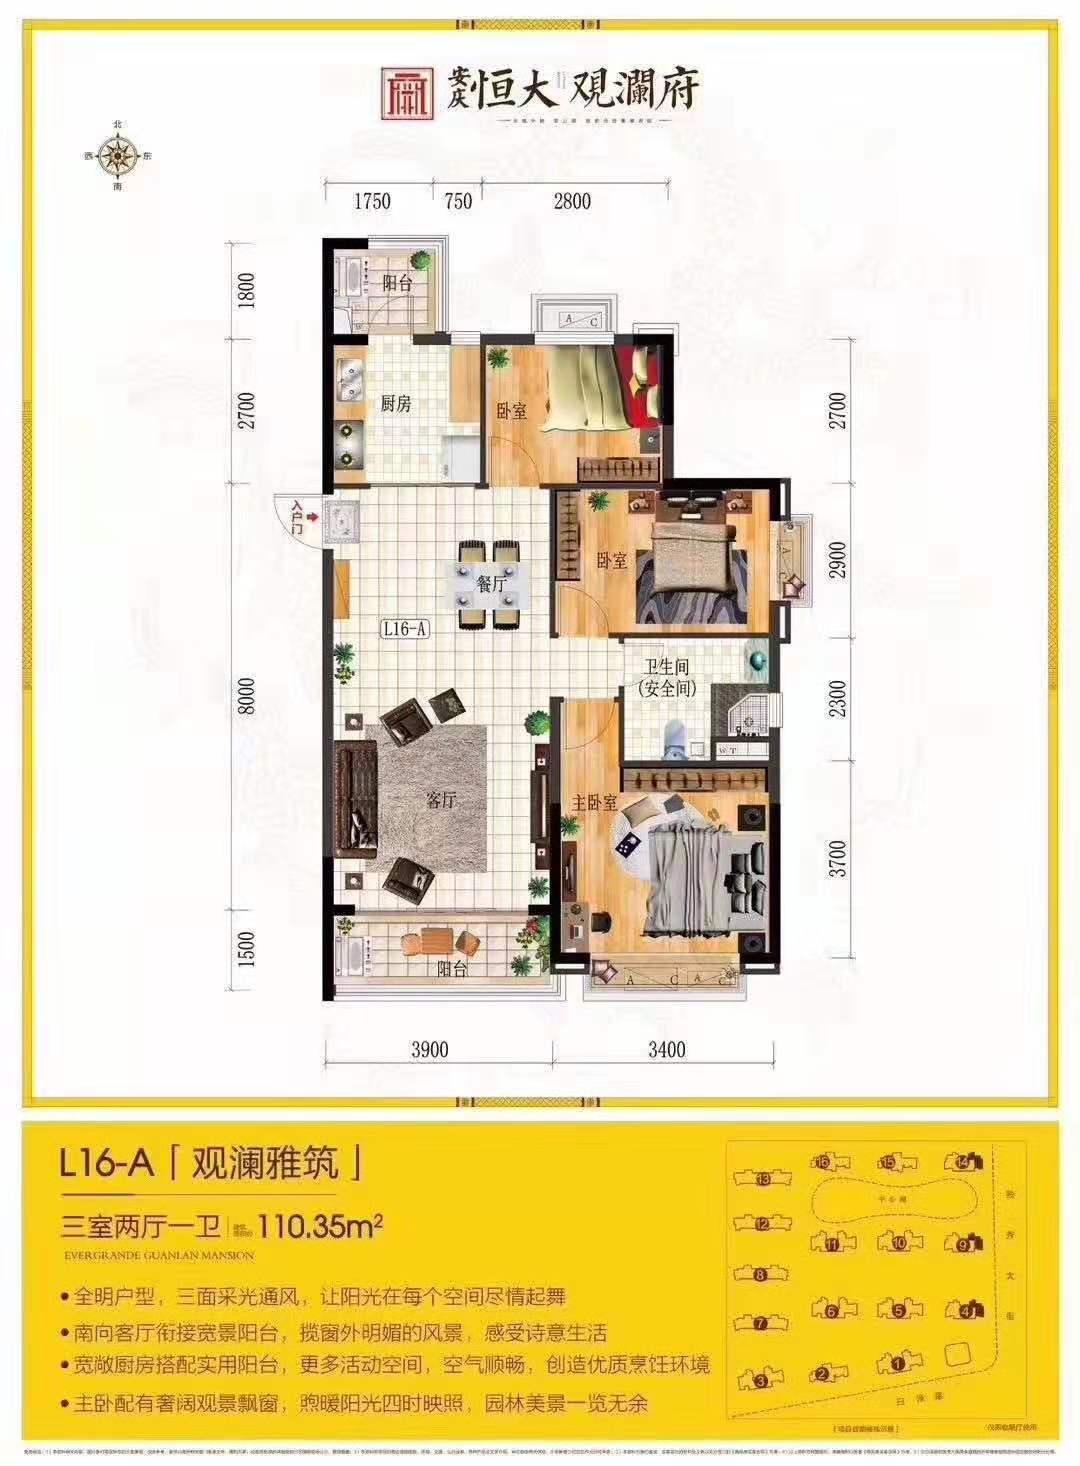 L16A户型 3室2厅1卫 110.35㎡